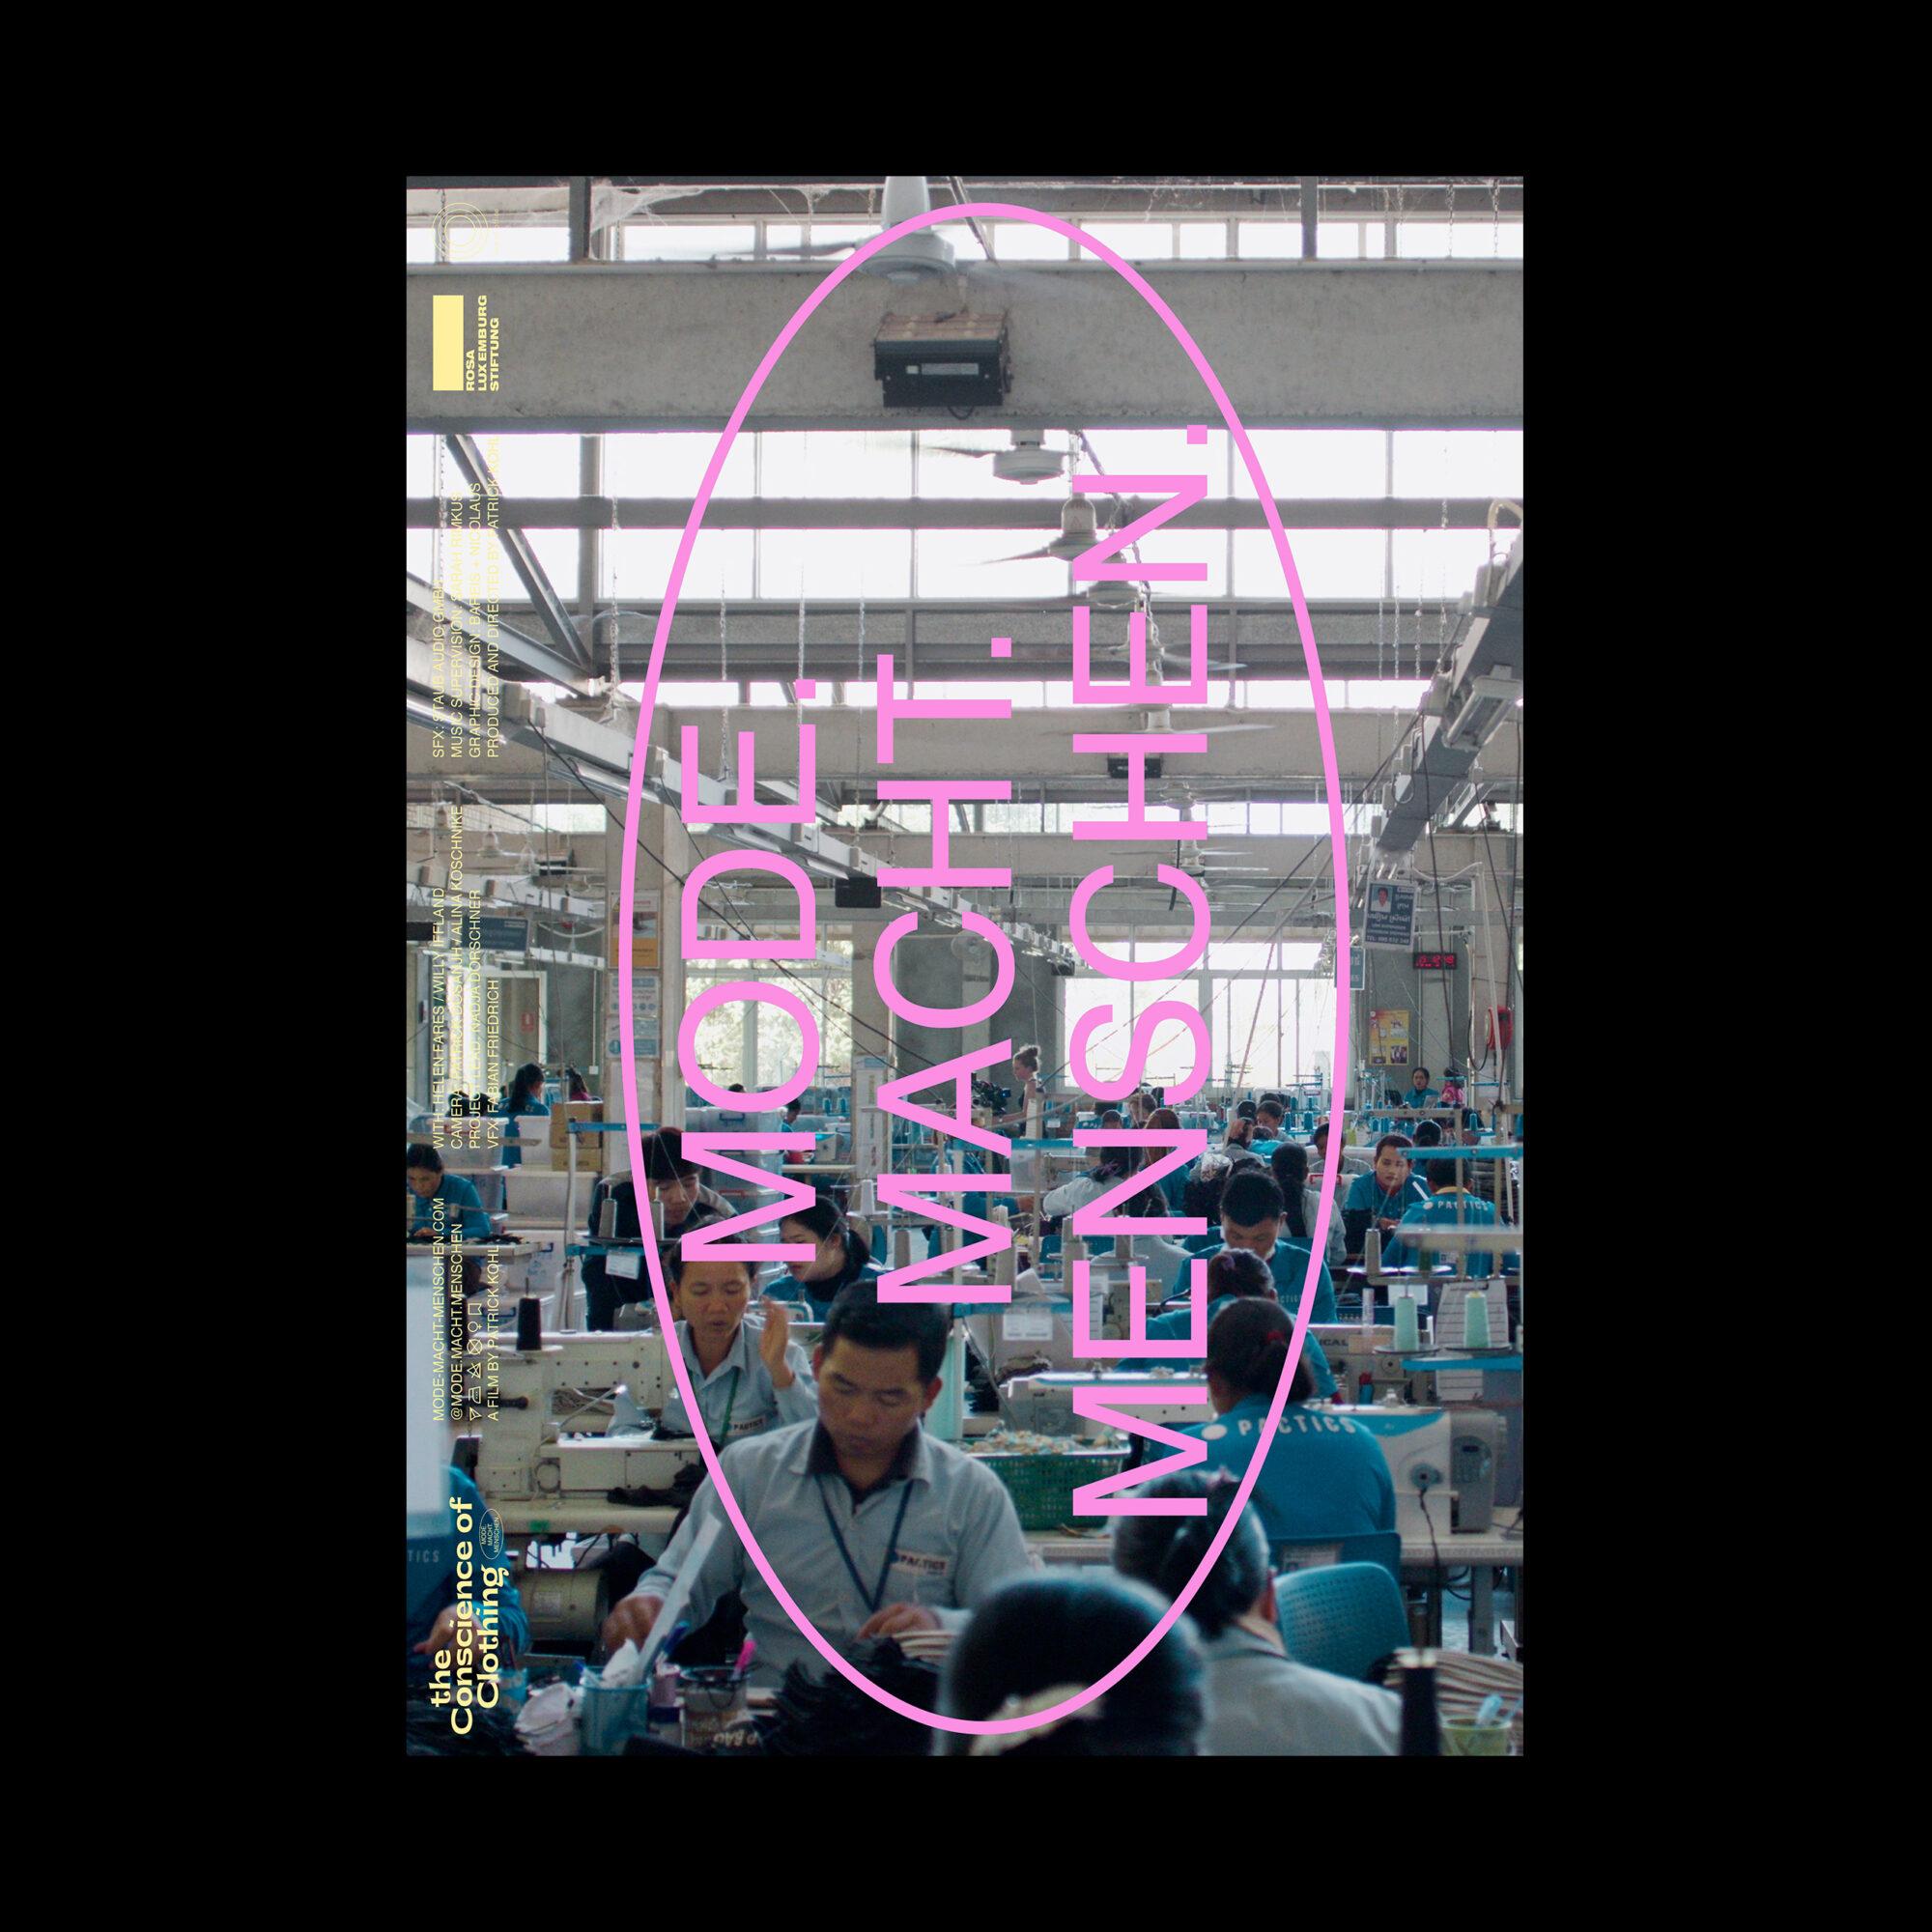 filmplakat patrick kohl berlin kambodscha